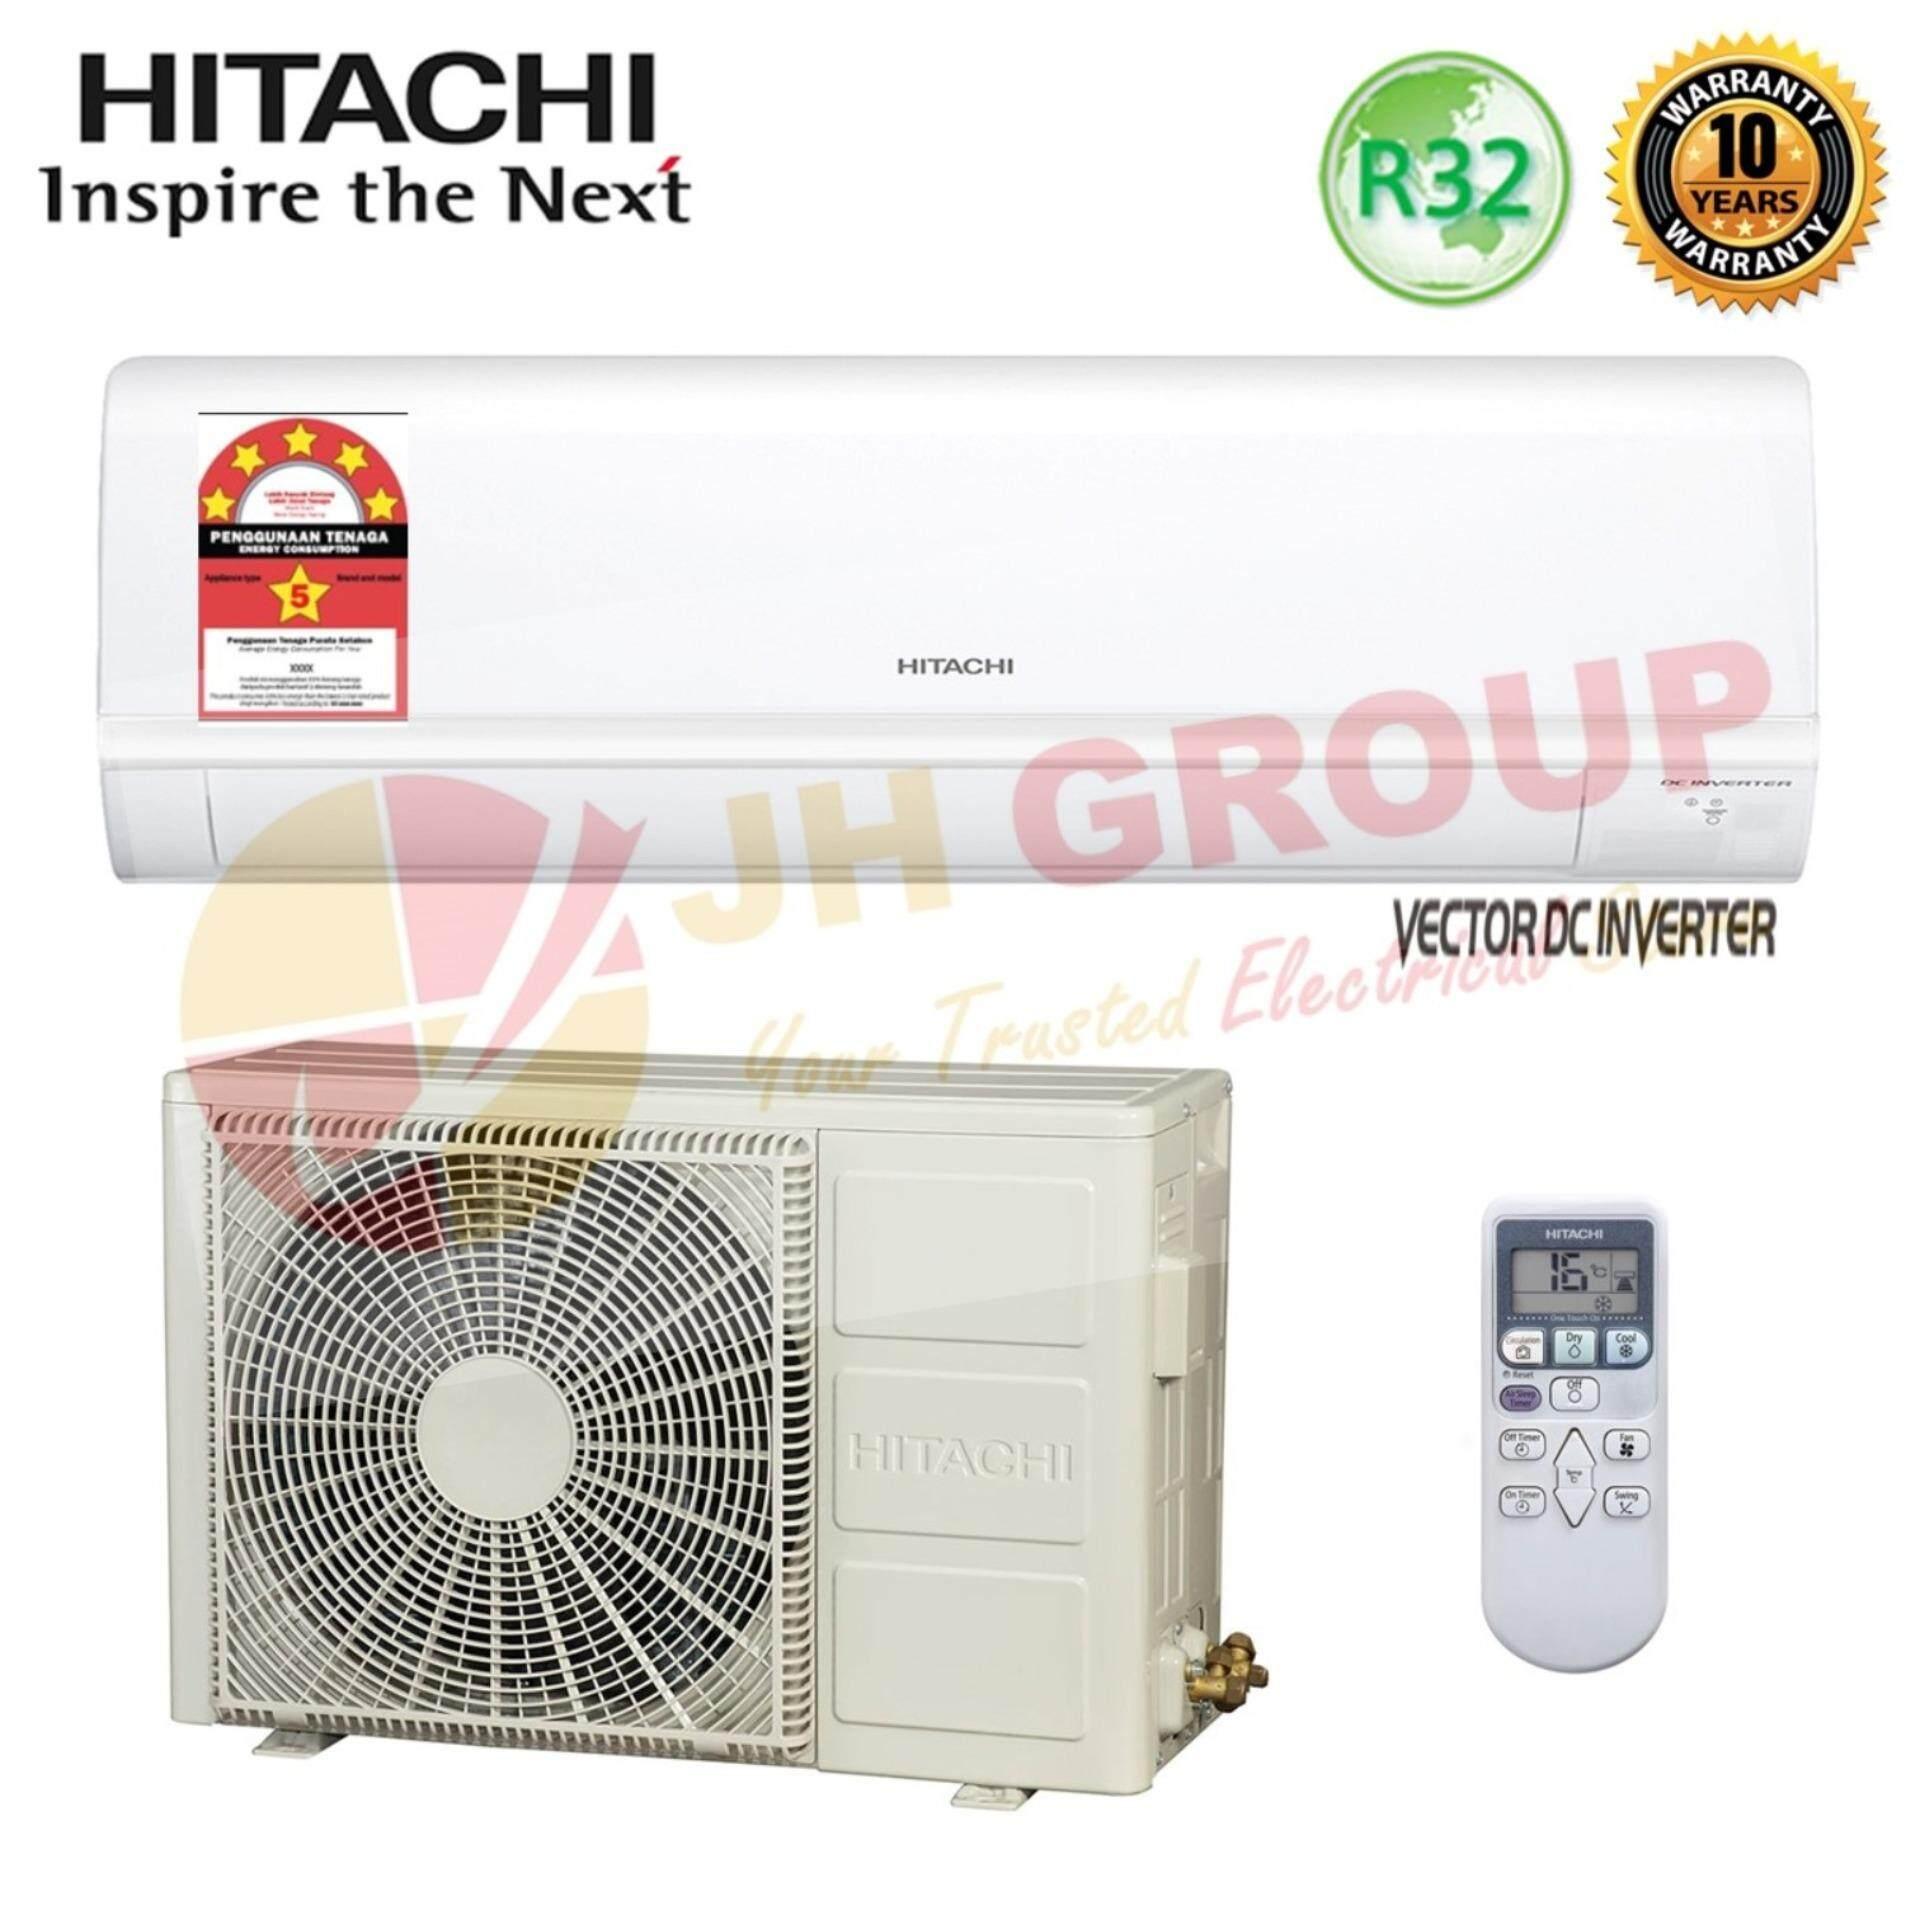 Features Hitachi Ras F10cj 1 0hp Standard Air Conditioner Htc